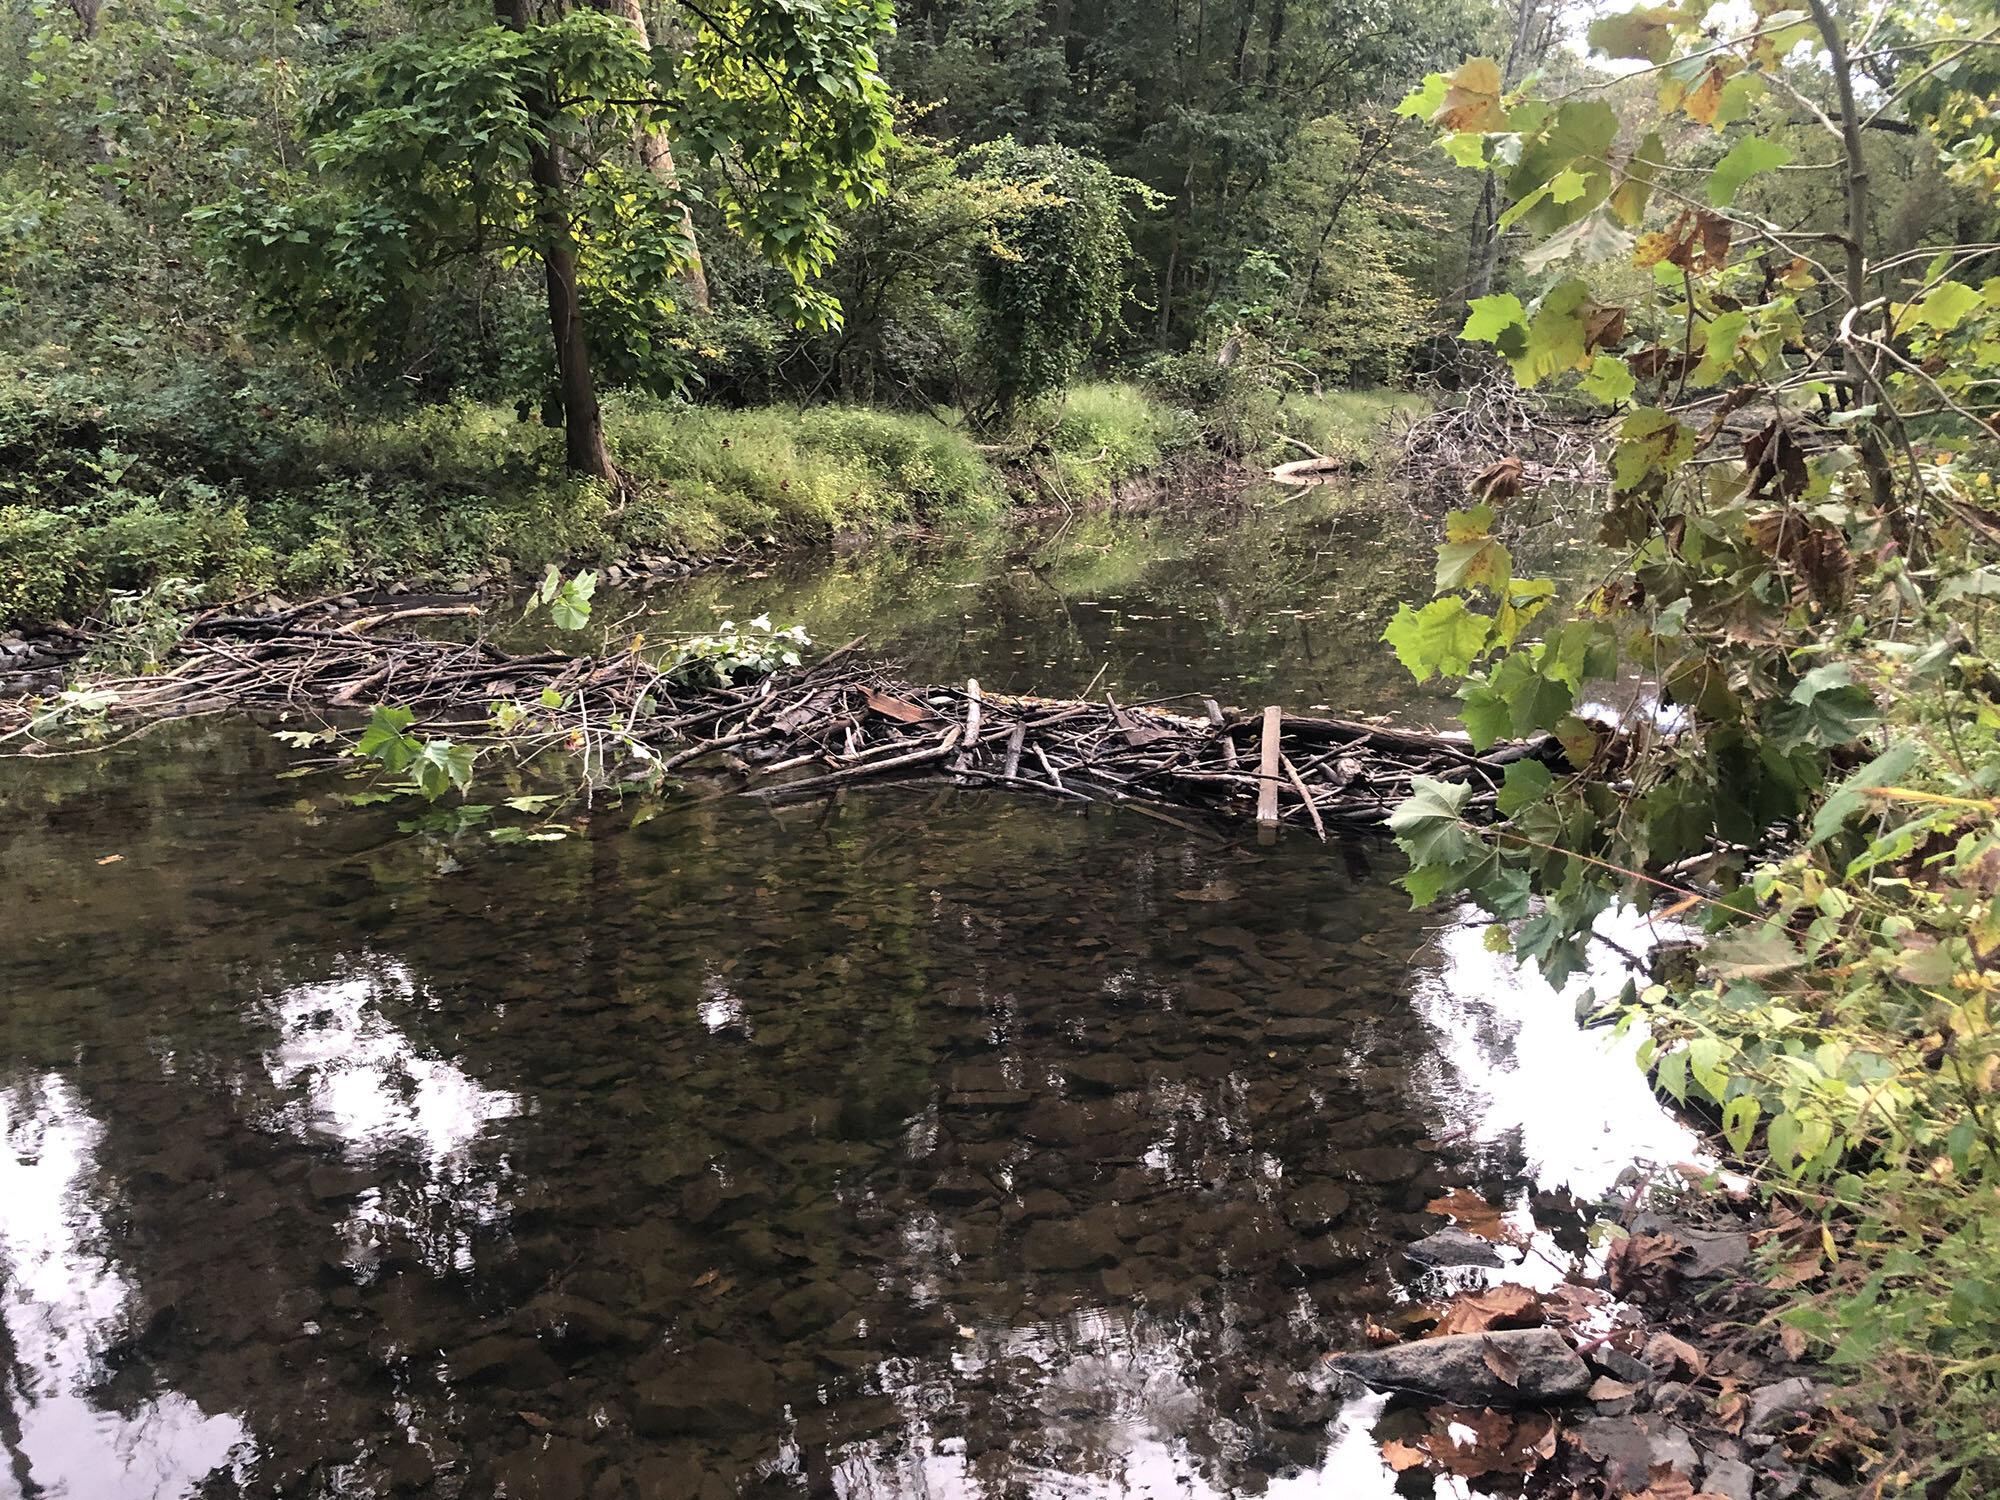 Beaver Dam on Crum Creek